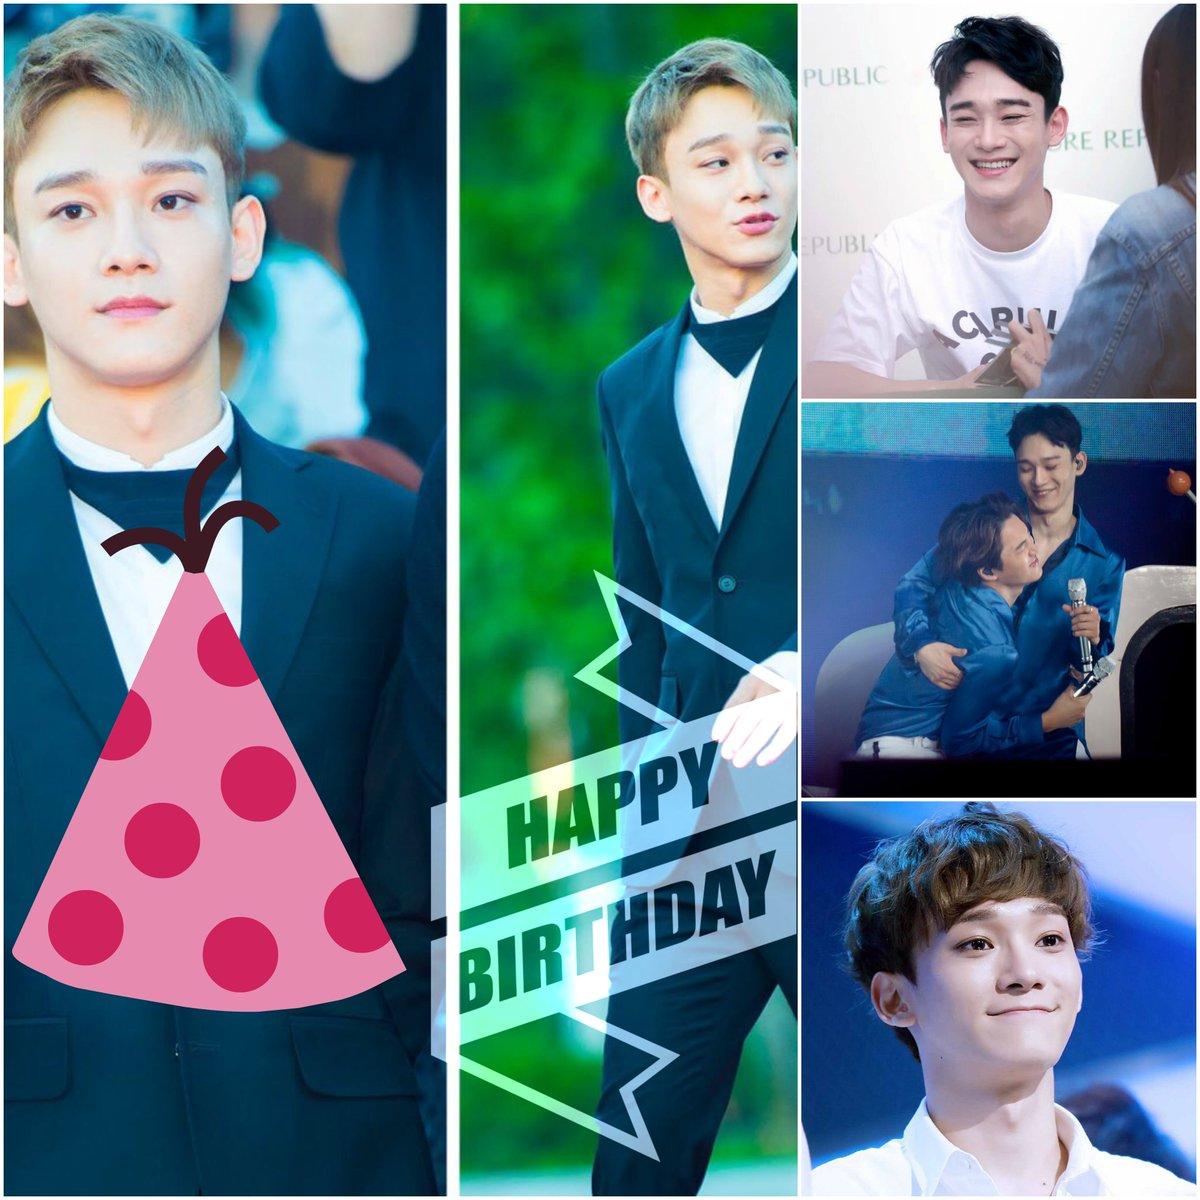 #HappyChenDay trends #1 worldwide for #EXO Chen's birthday! https://t.co/j7rBDqadya